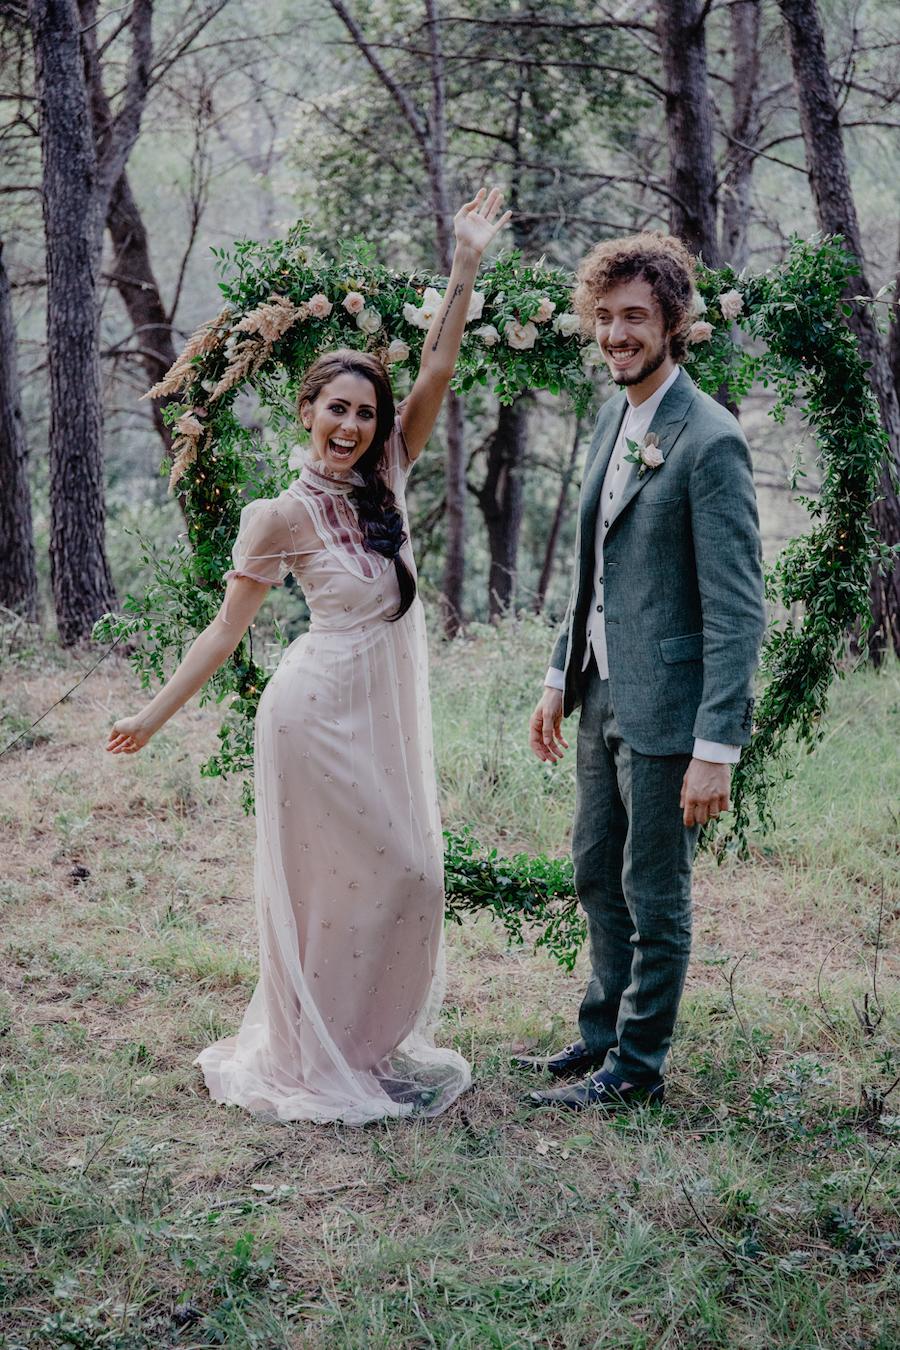 matrimonio fiabesco nel bosco